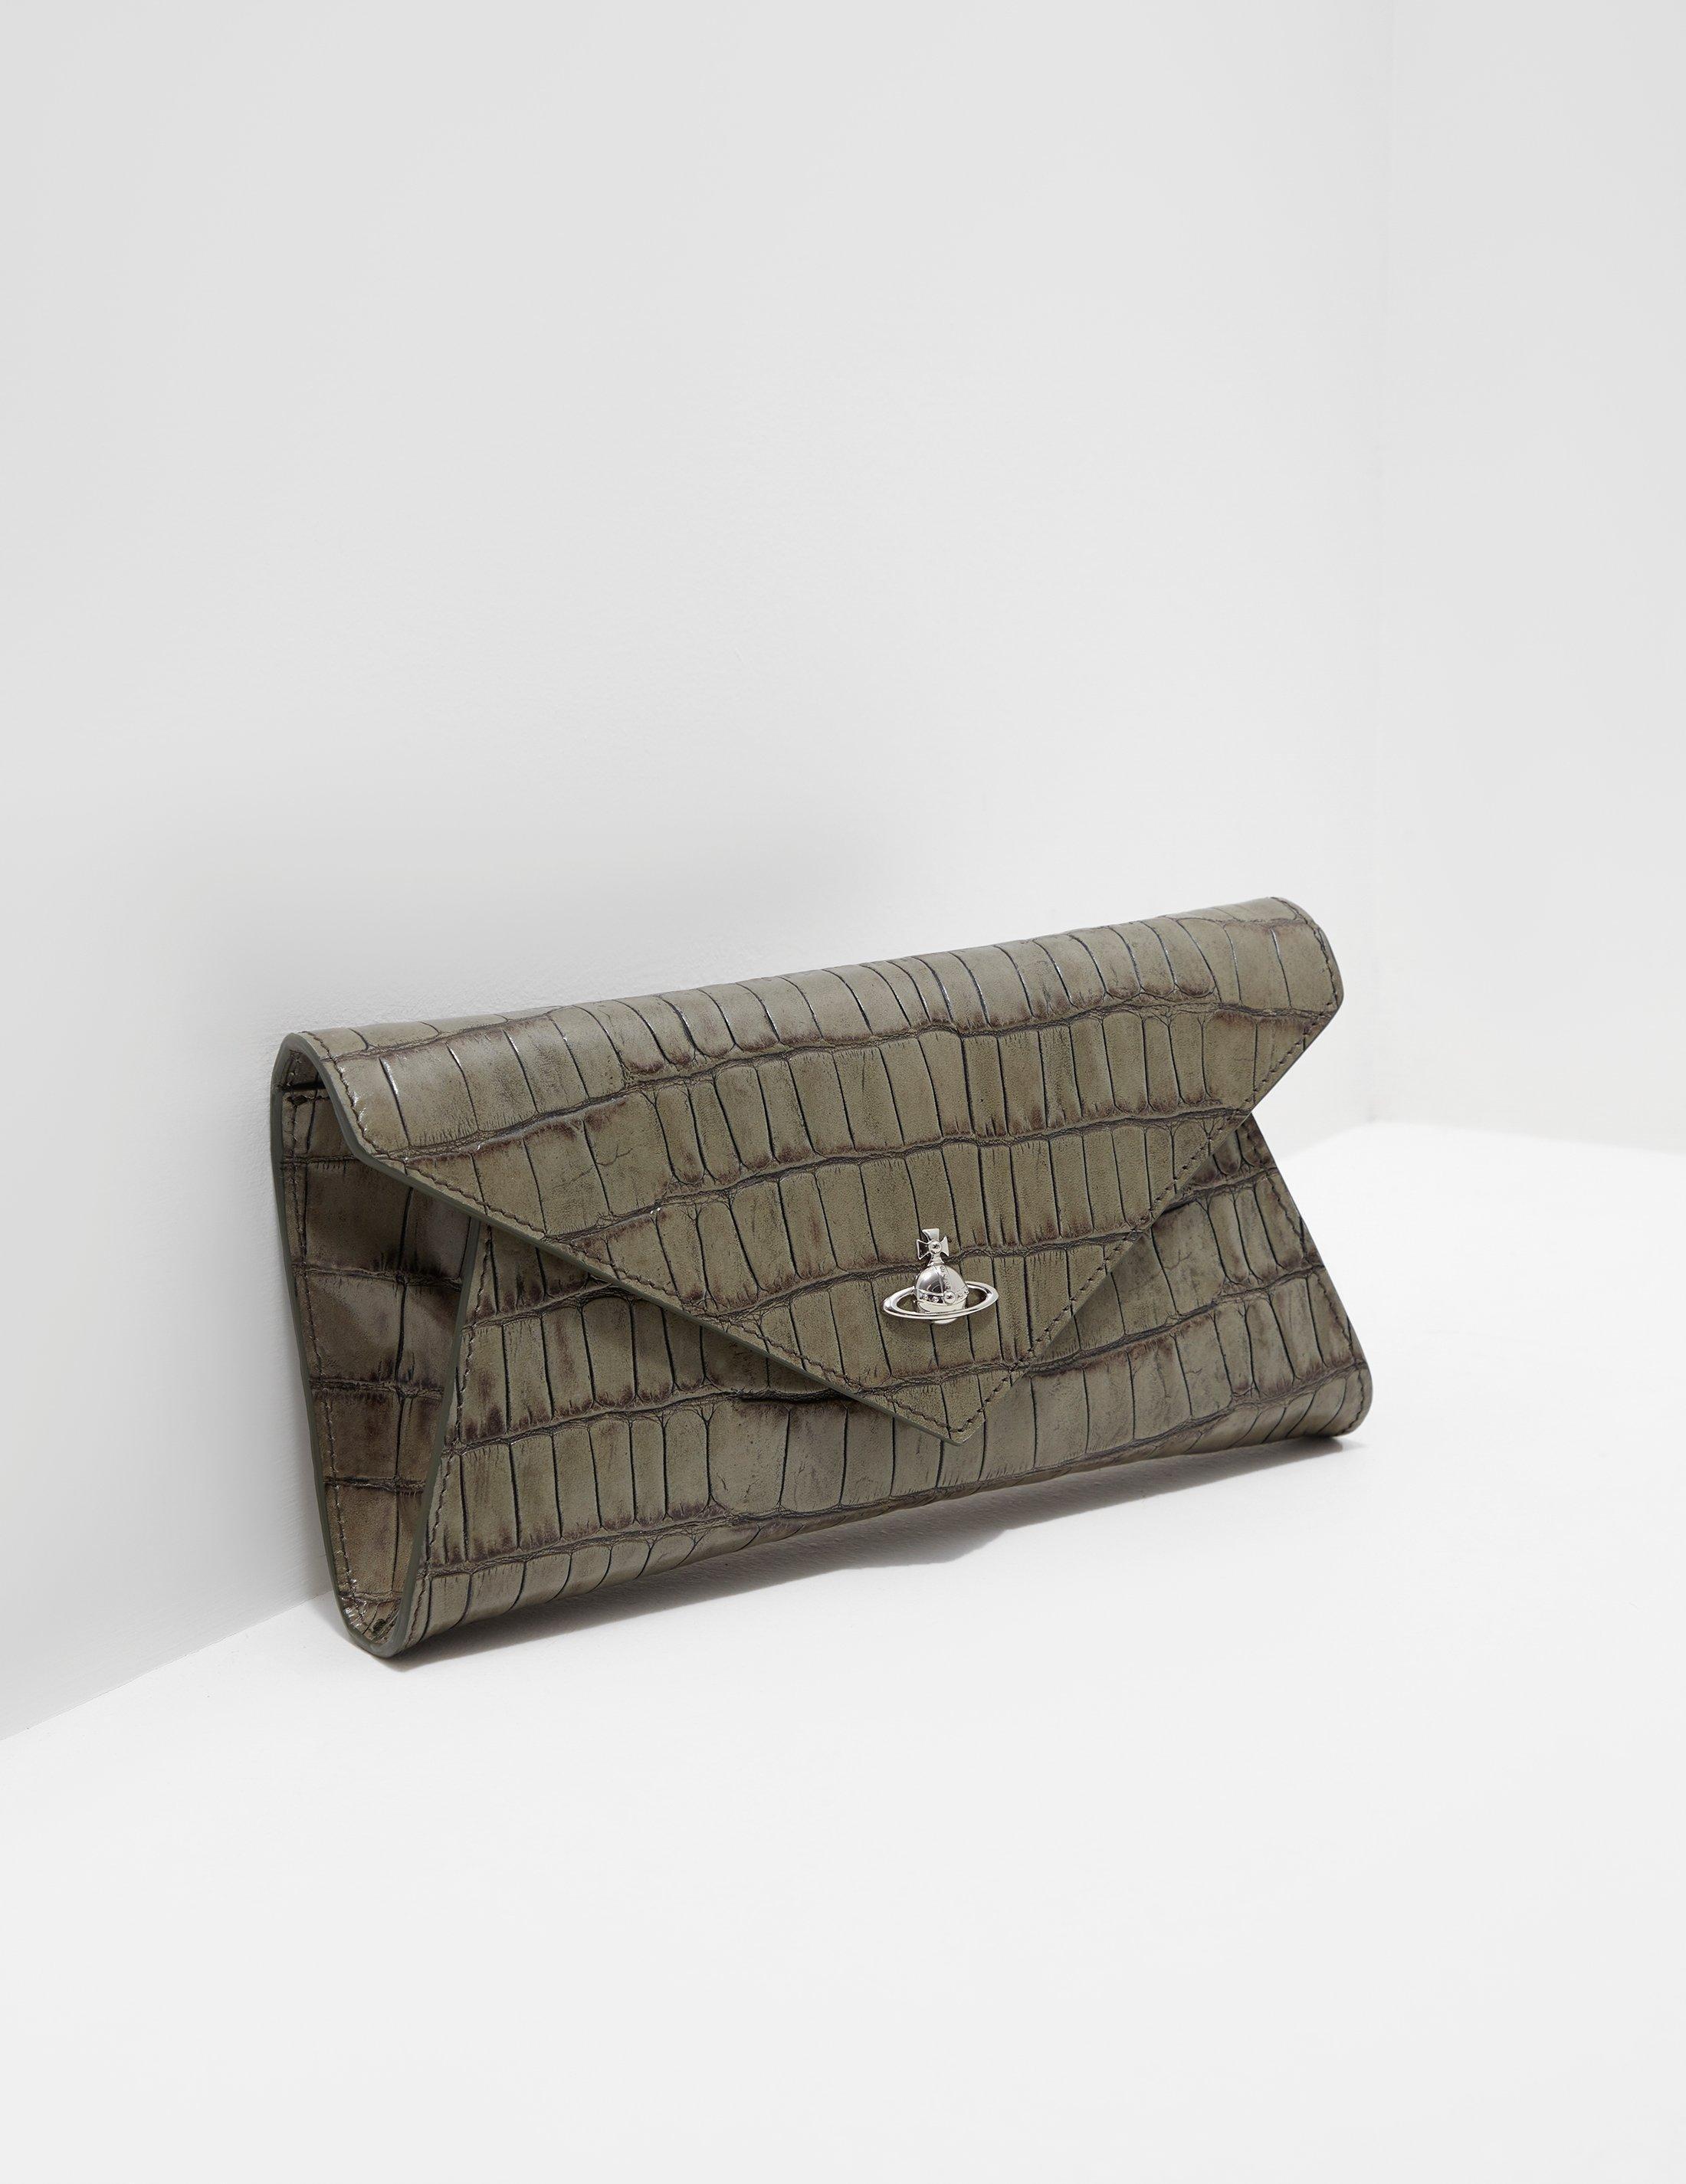 b8ed4c5de7719 Lyst - Vivienne Westwood Lisa Croc Envelope Clutch Bag - Online ...